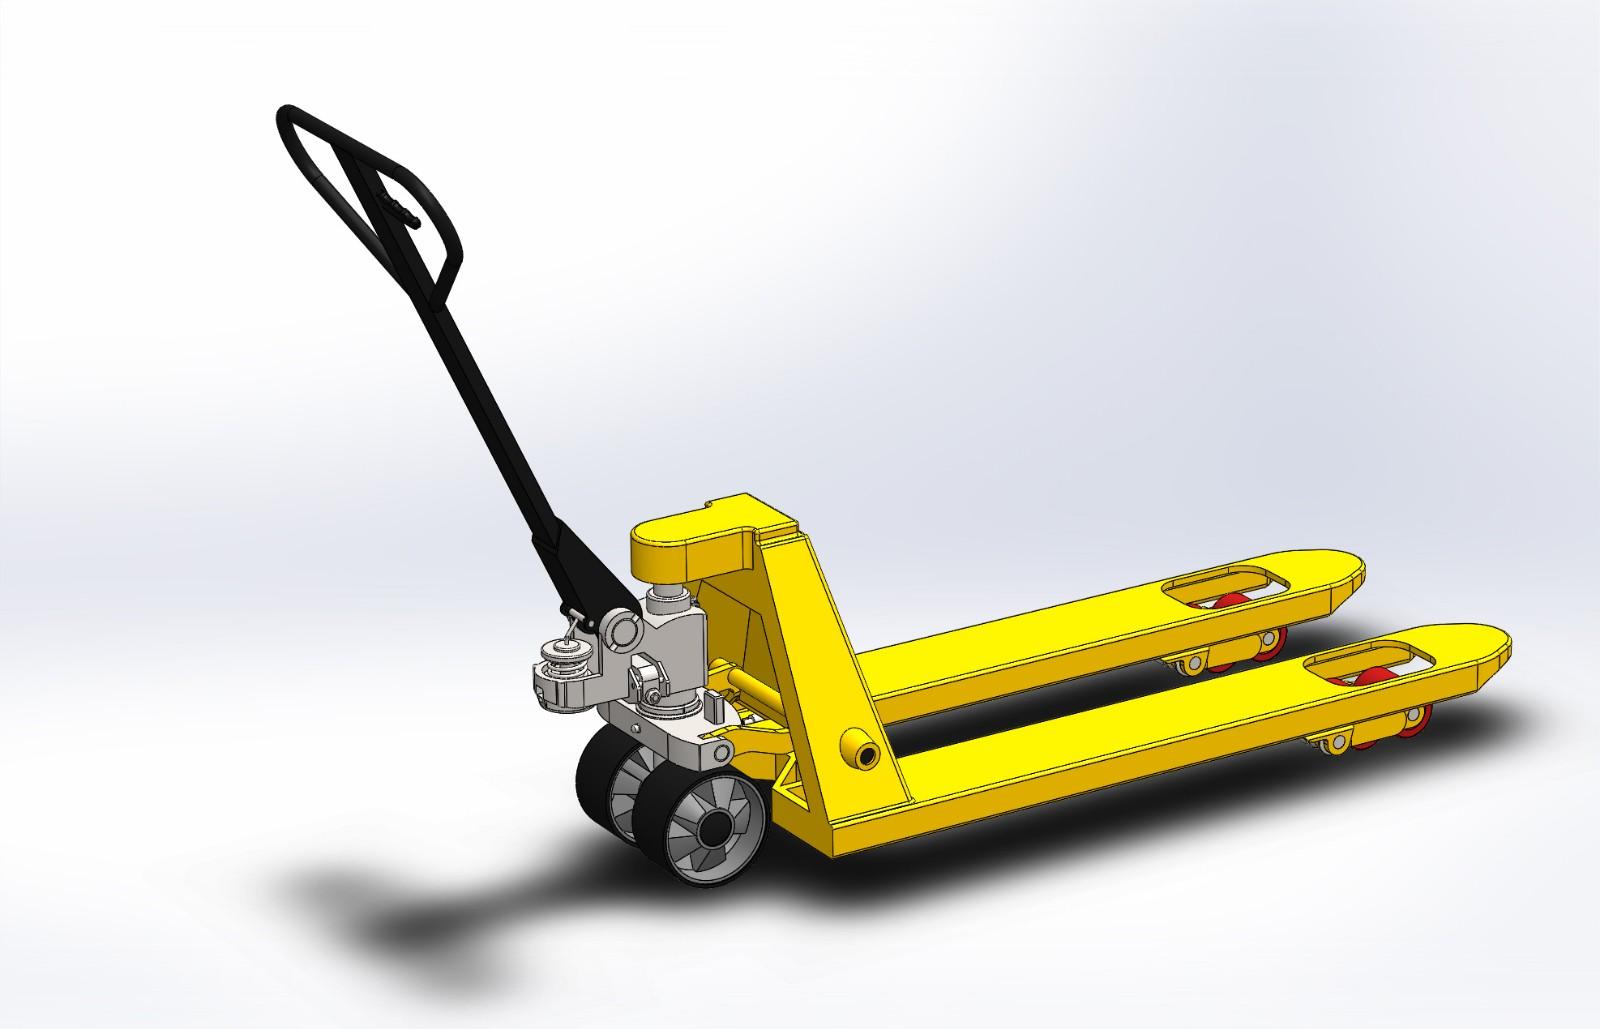 SolidWorks模型免费下载:手推叉车